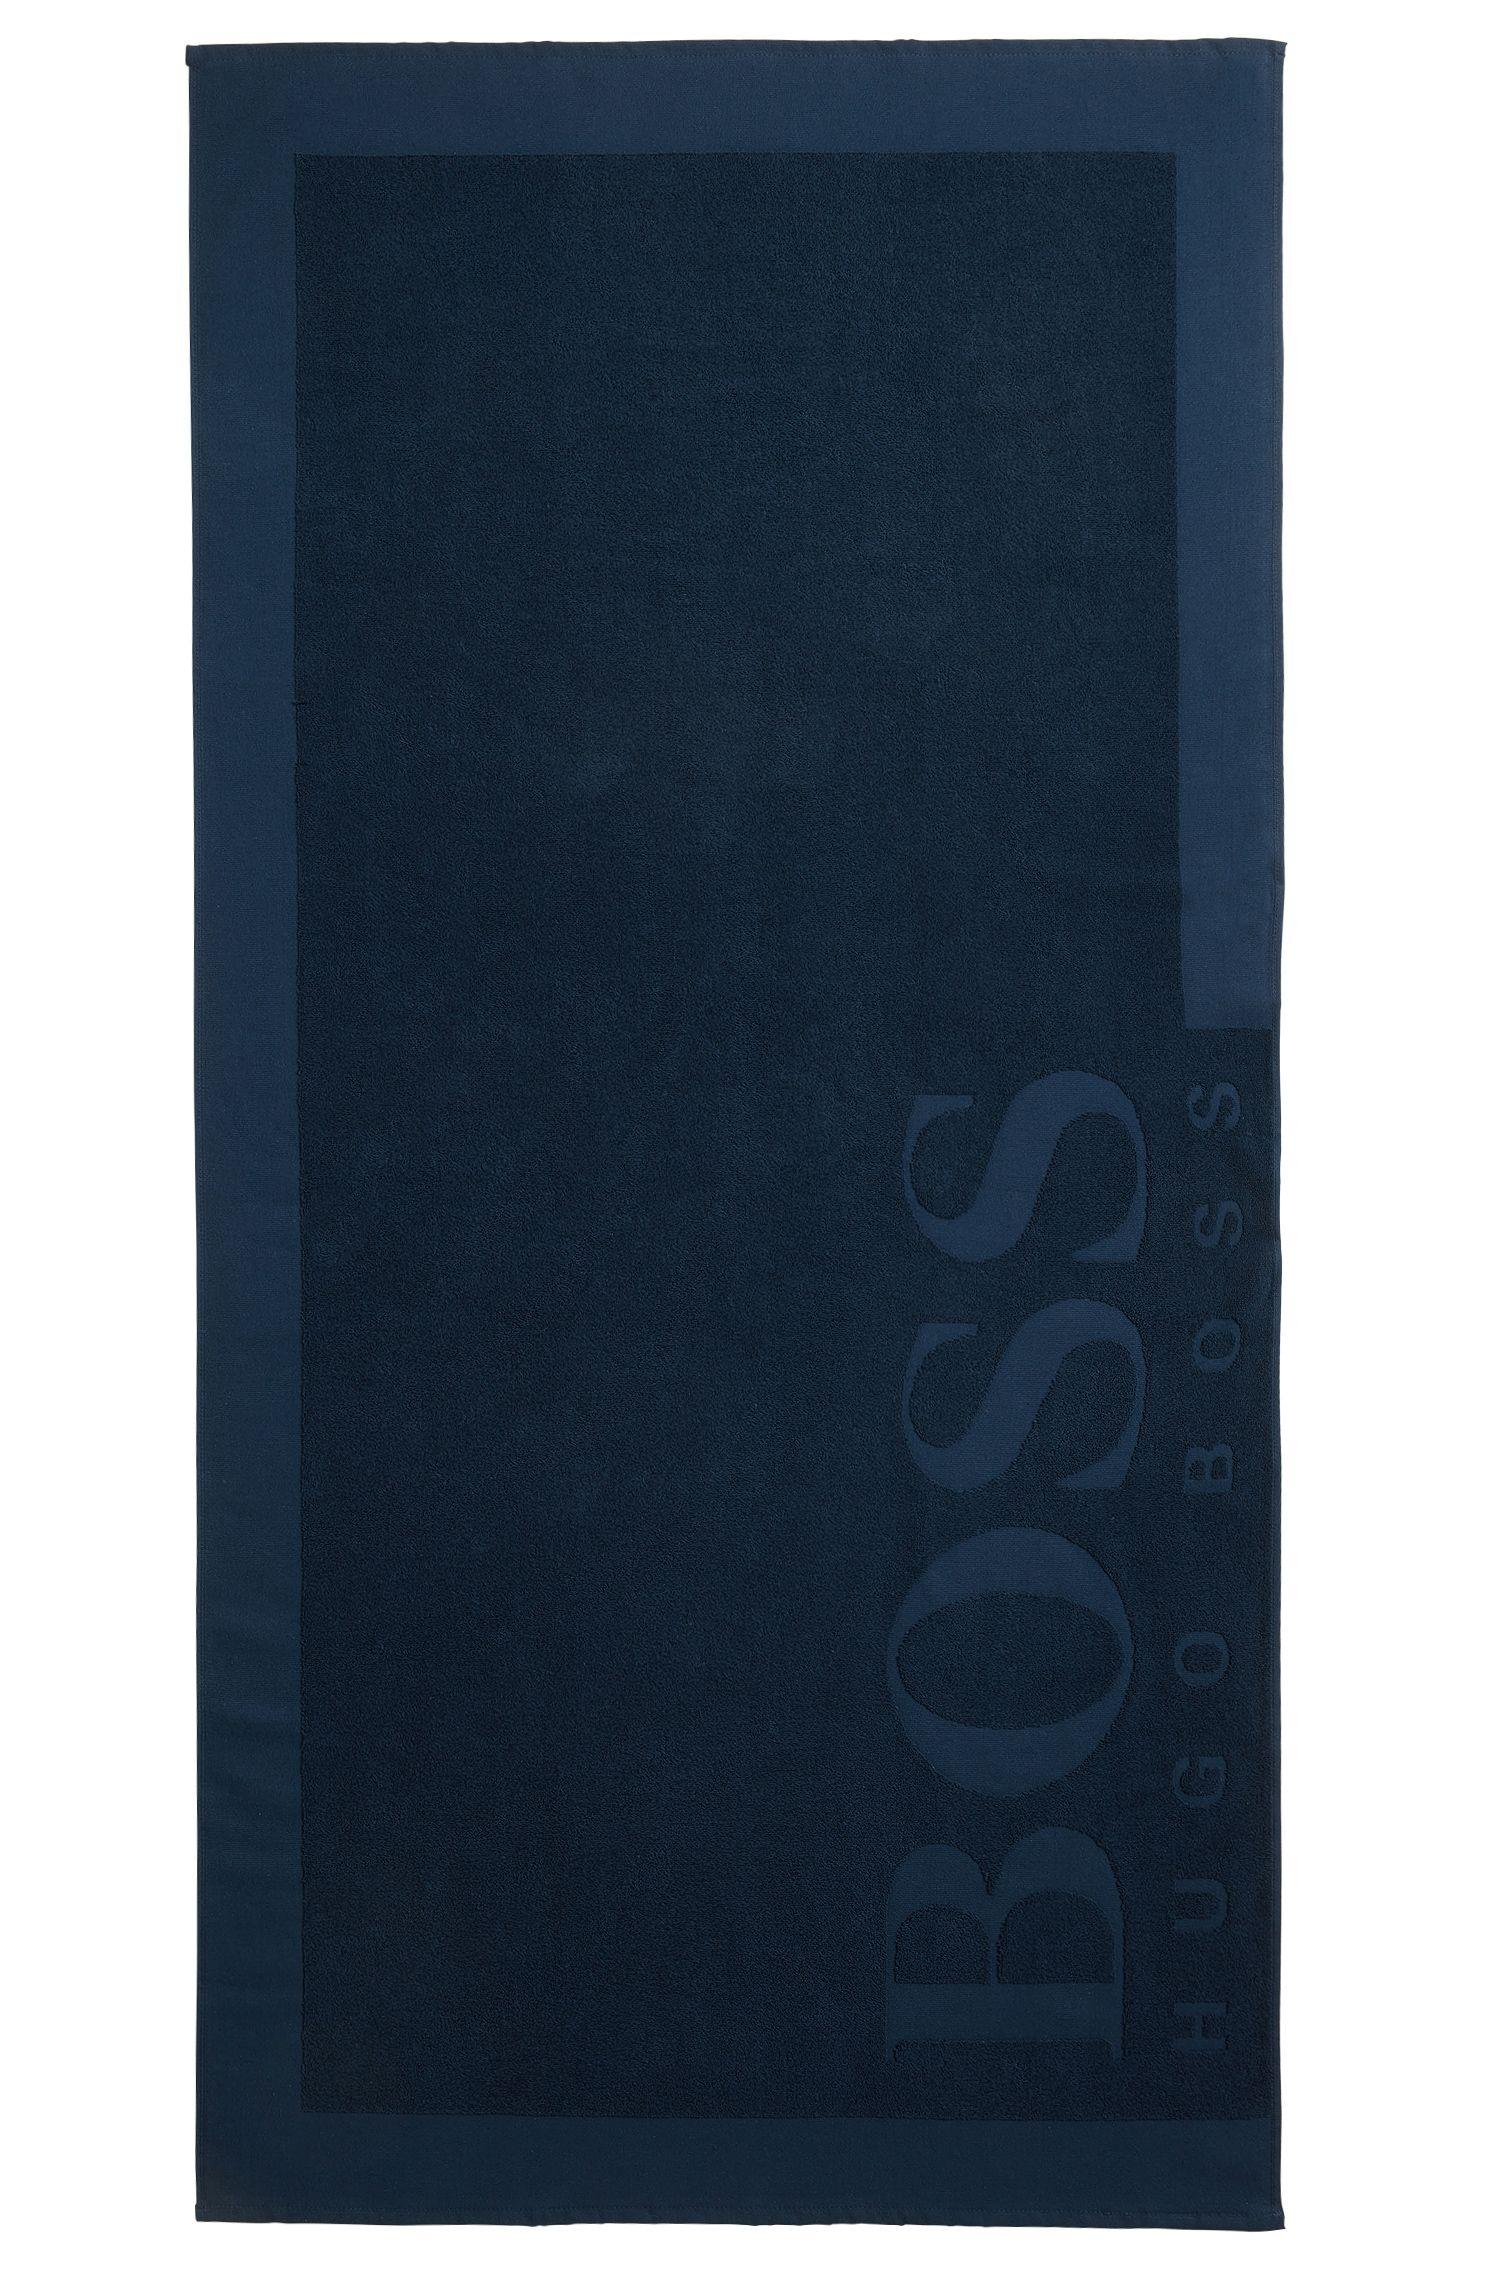 Badetuch aus softem Baumwoll-Jacquard mit Logo